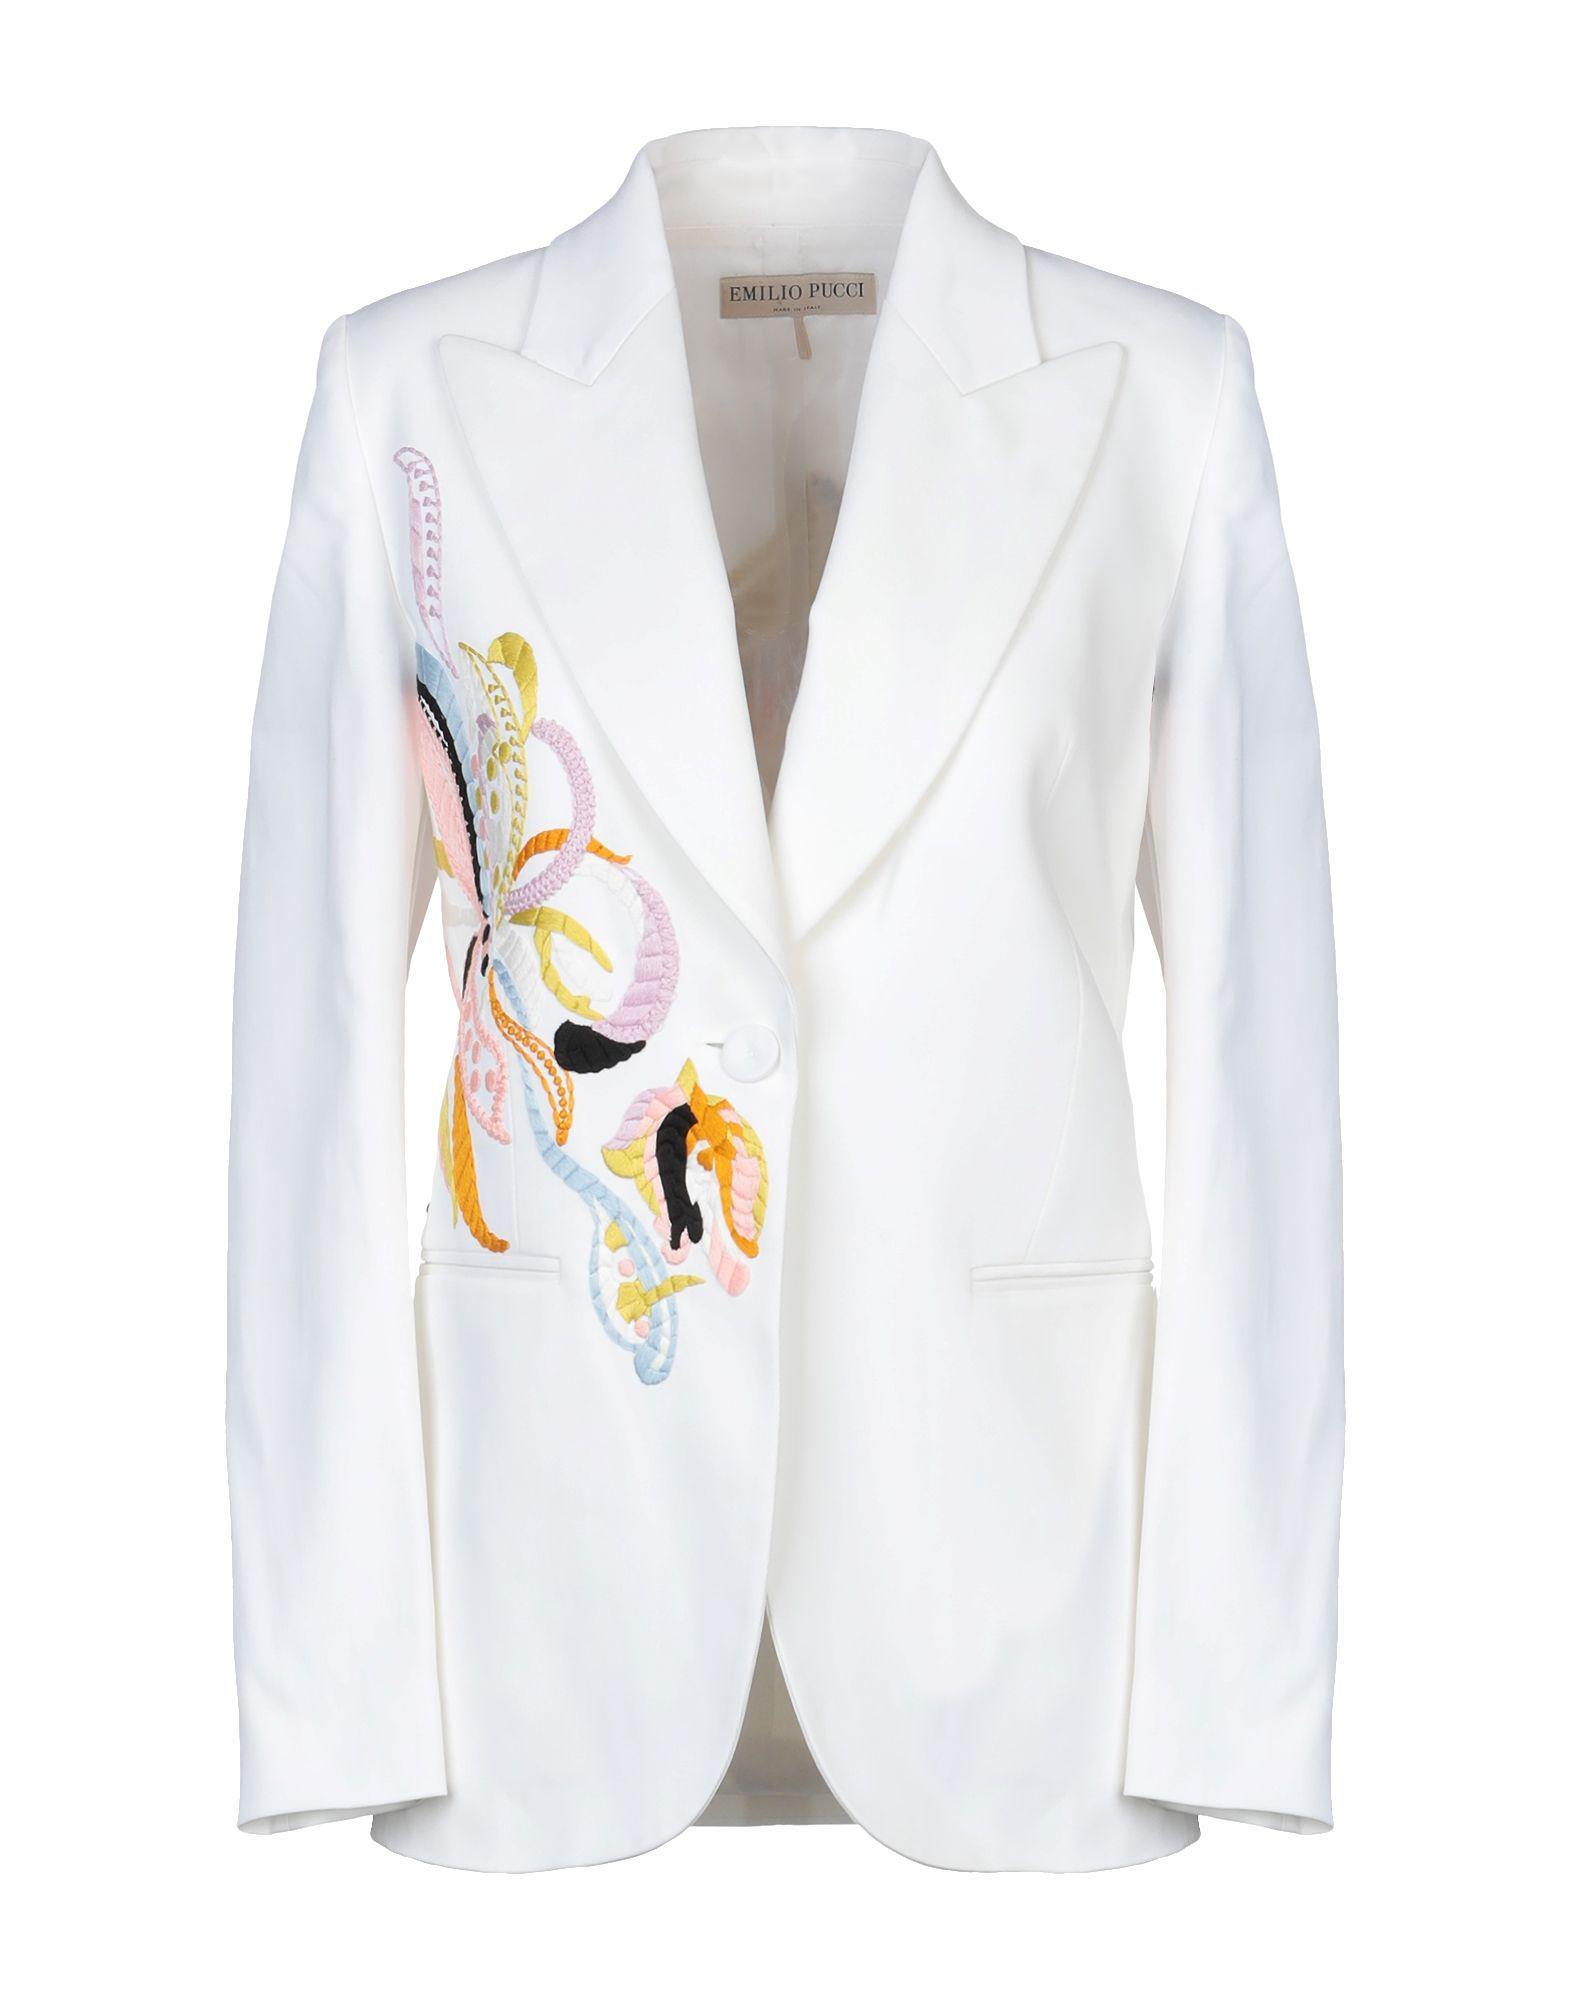 49863d7b8f8d Emilio Pucci - White Blazer - Lyst. View fullscreen